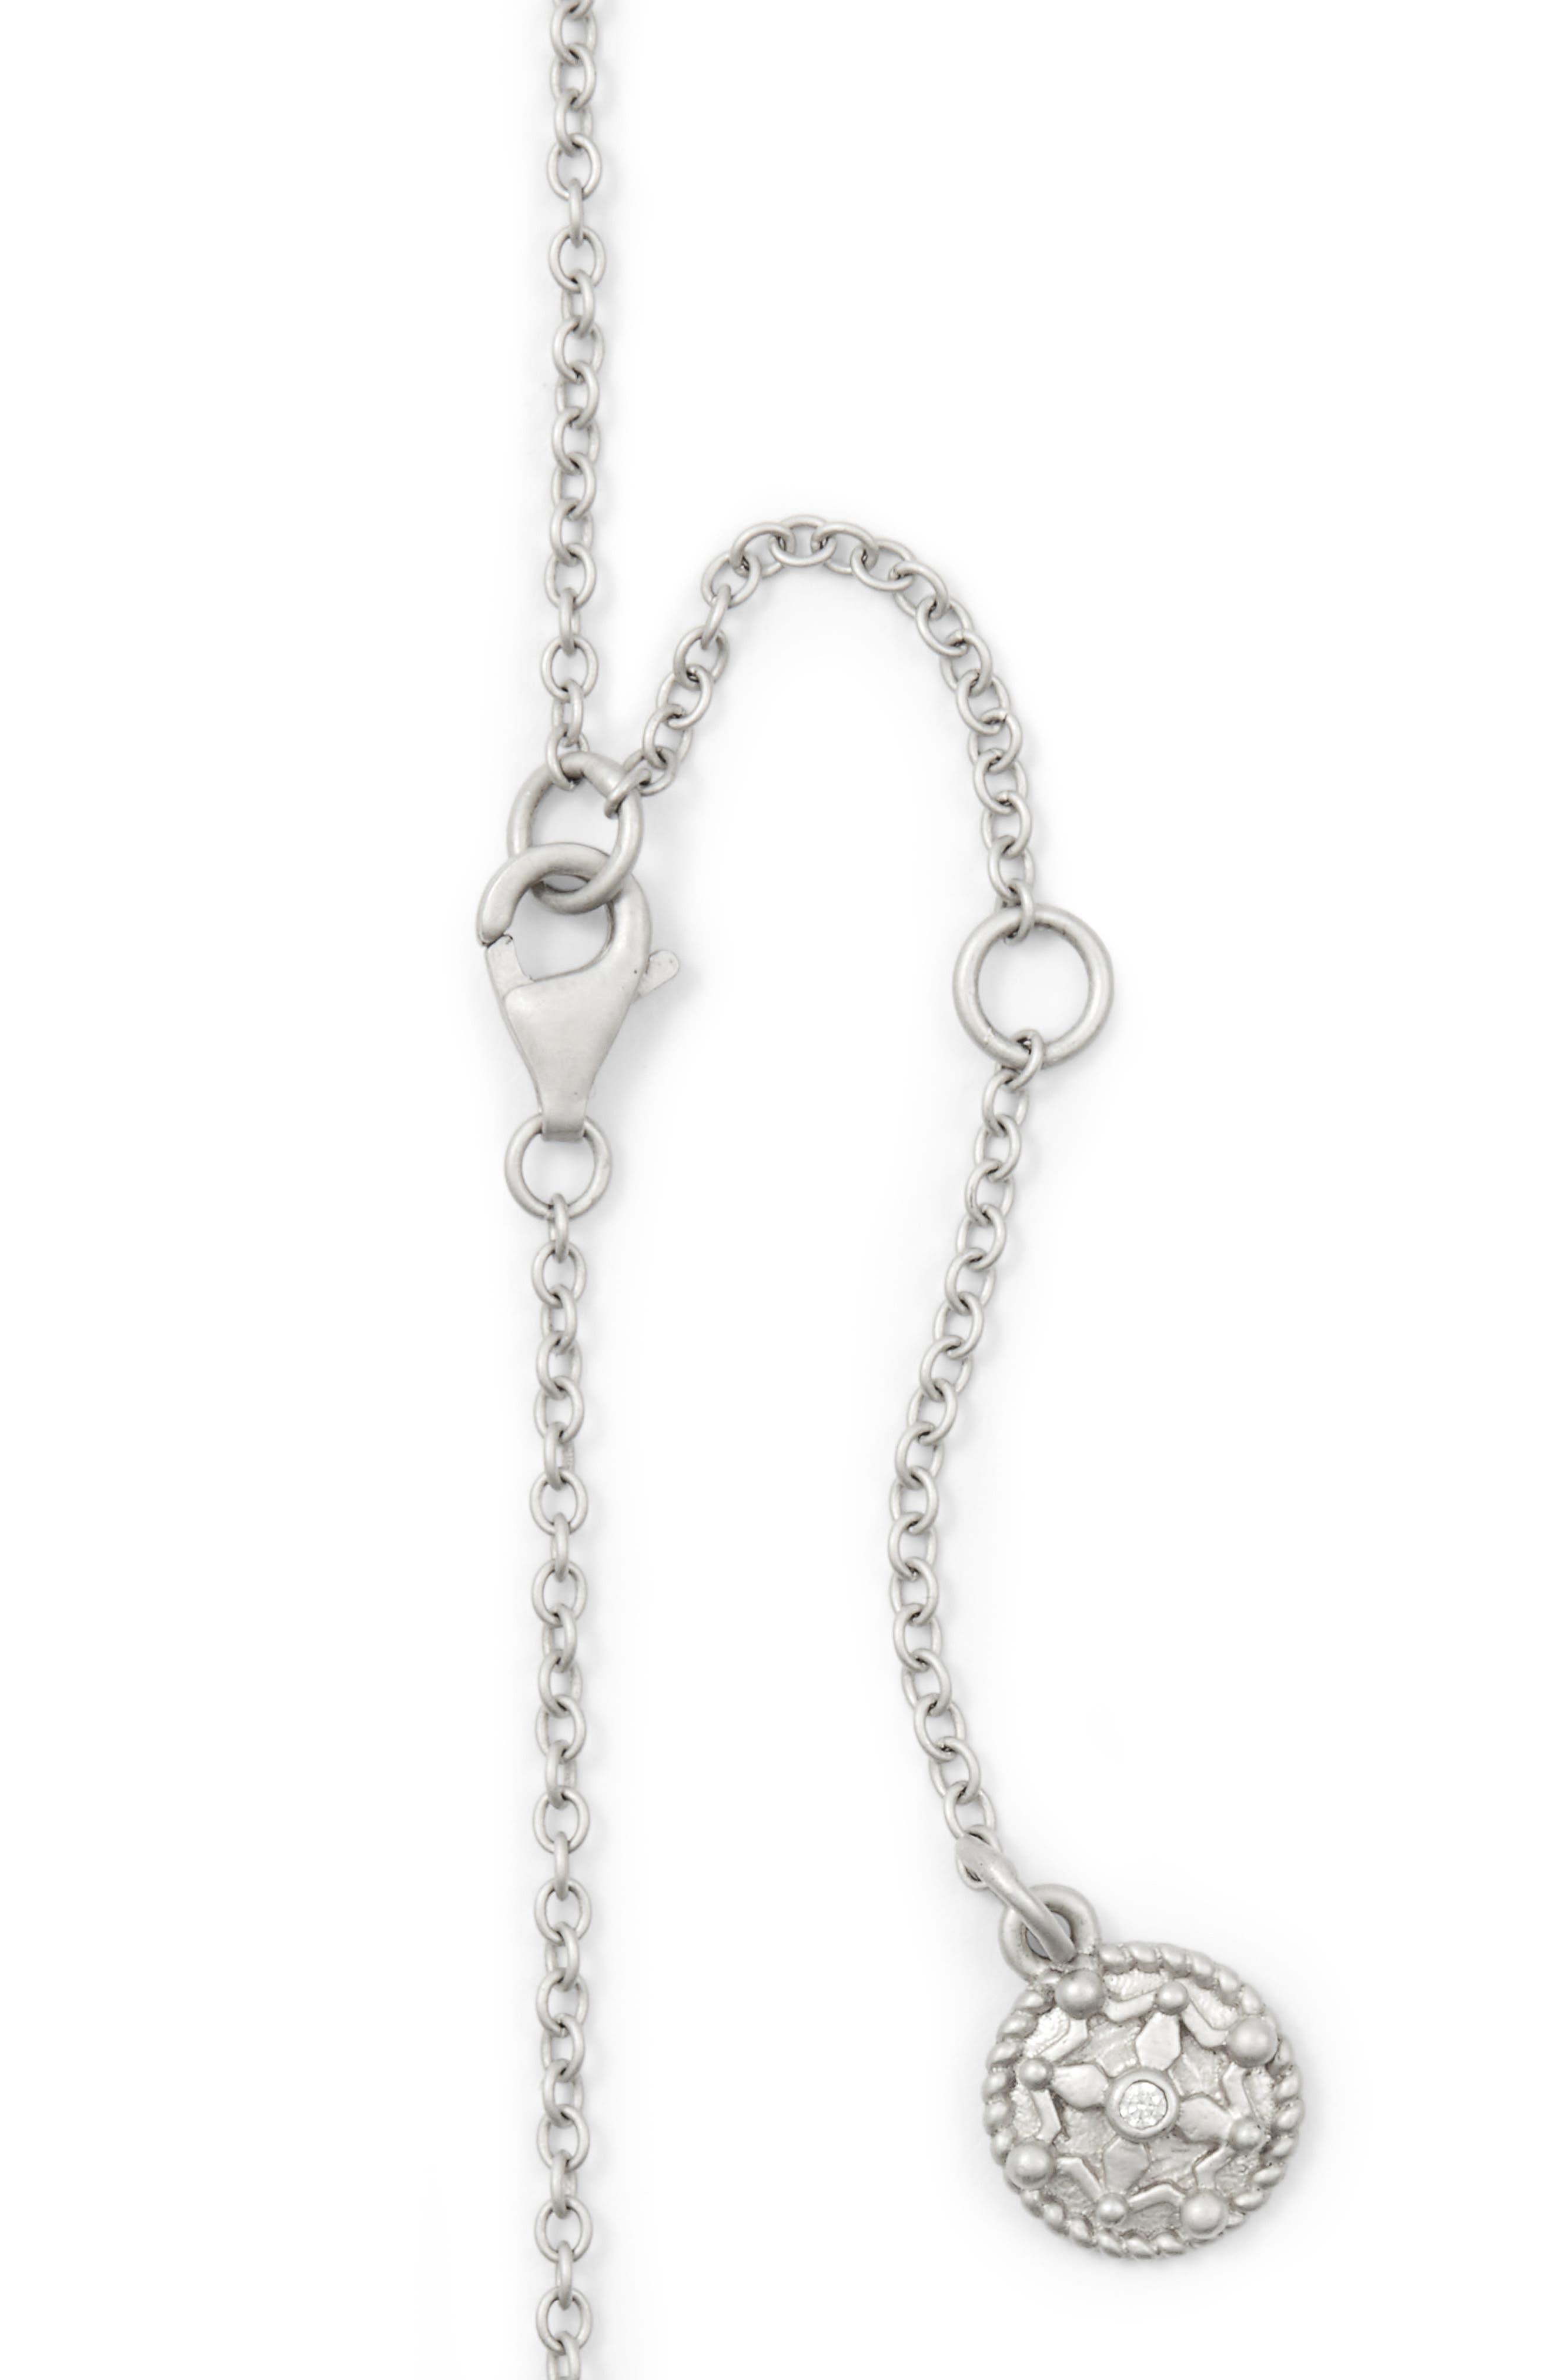 Contemporary Deco Celestial Pendant Necklace,                             Alternate thumbnail 5, color,                             Silver/ Black